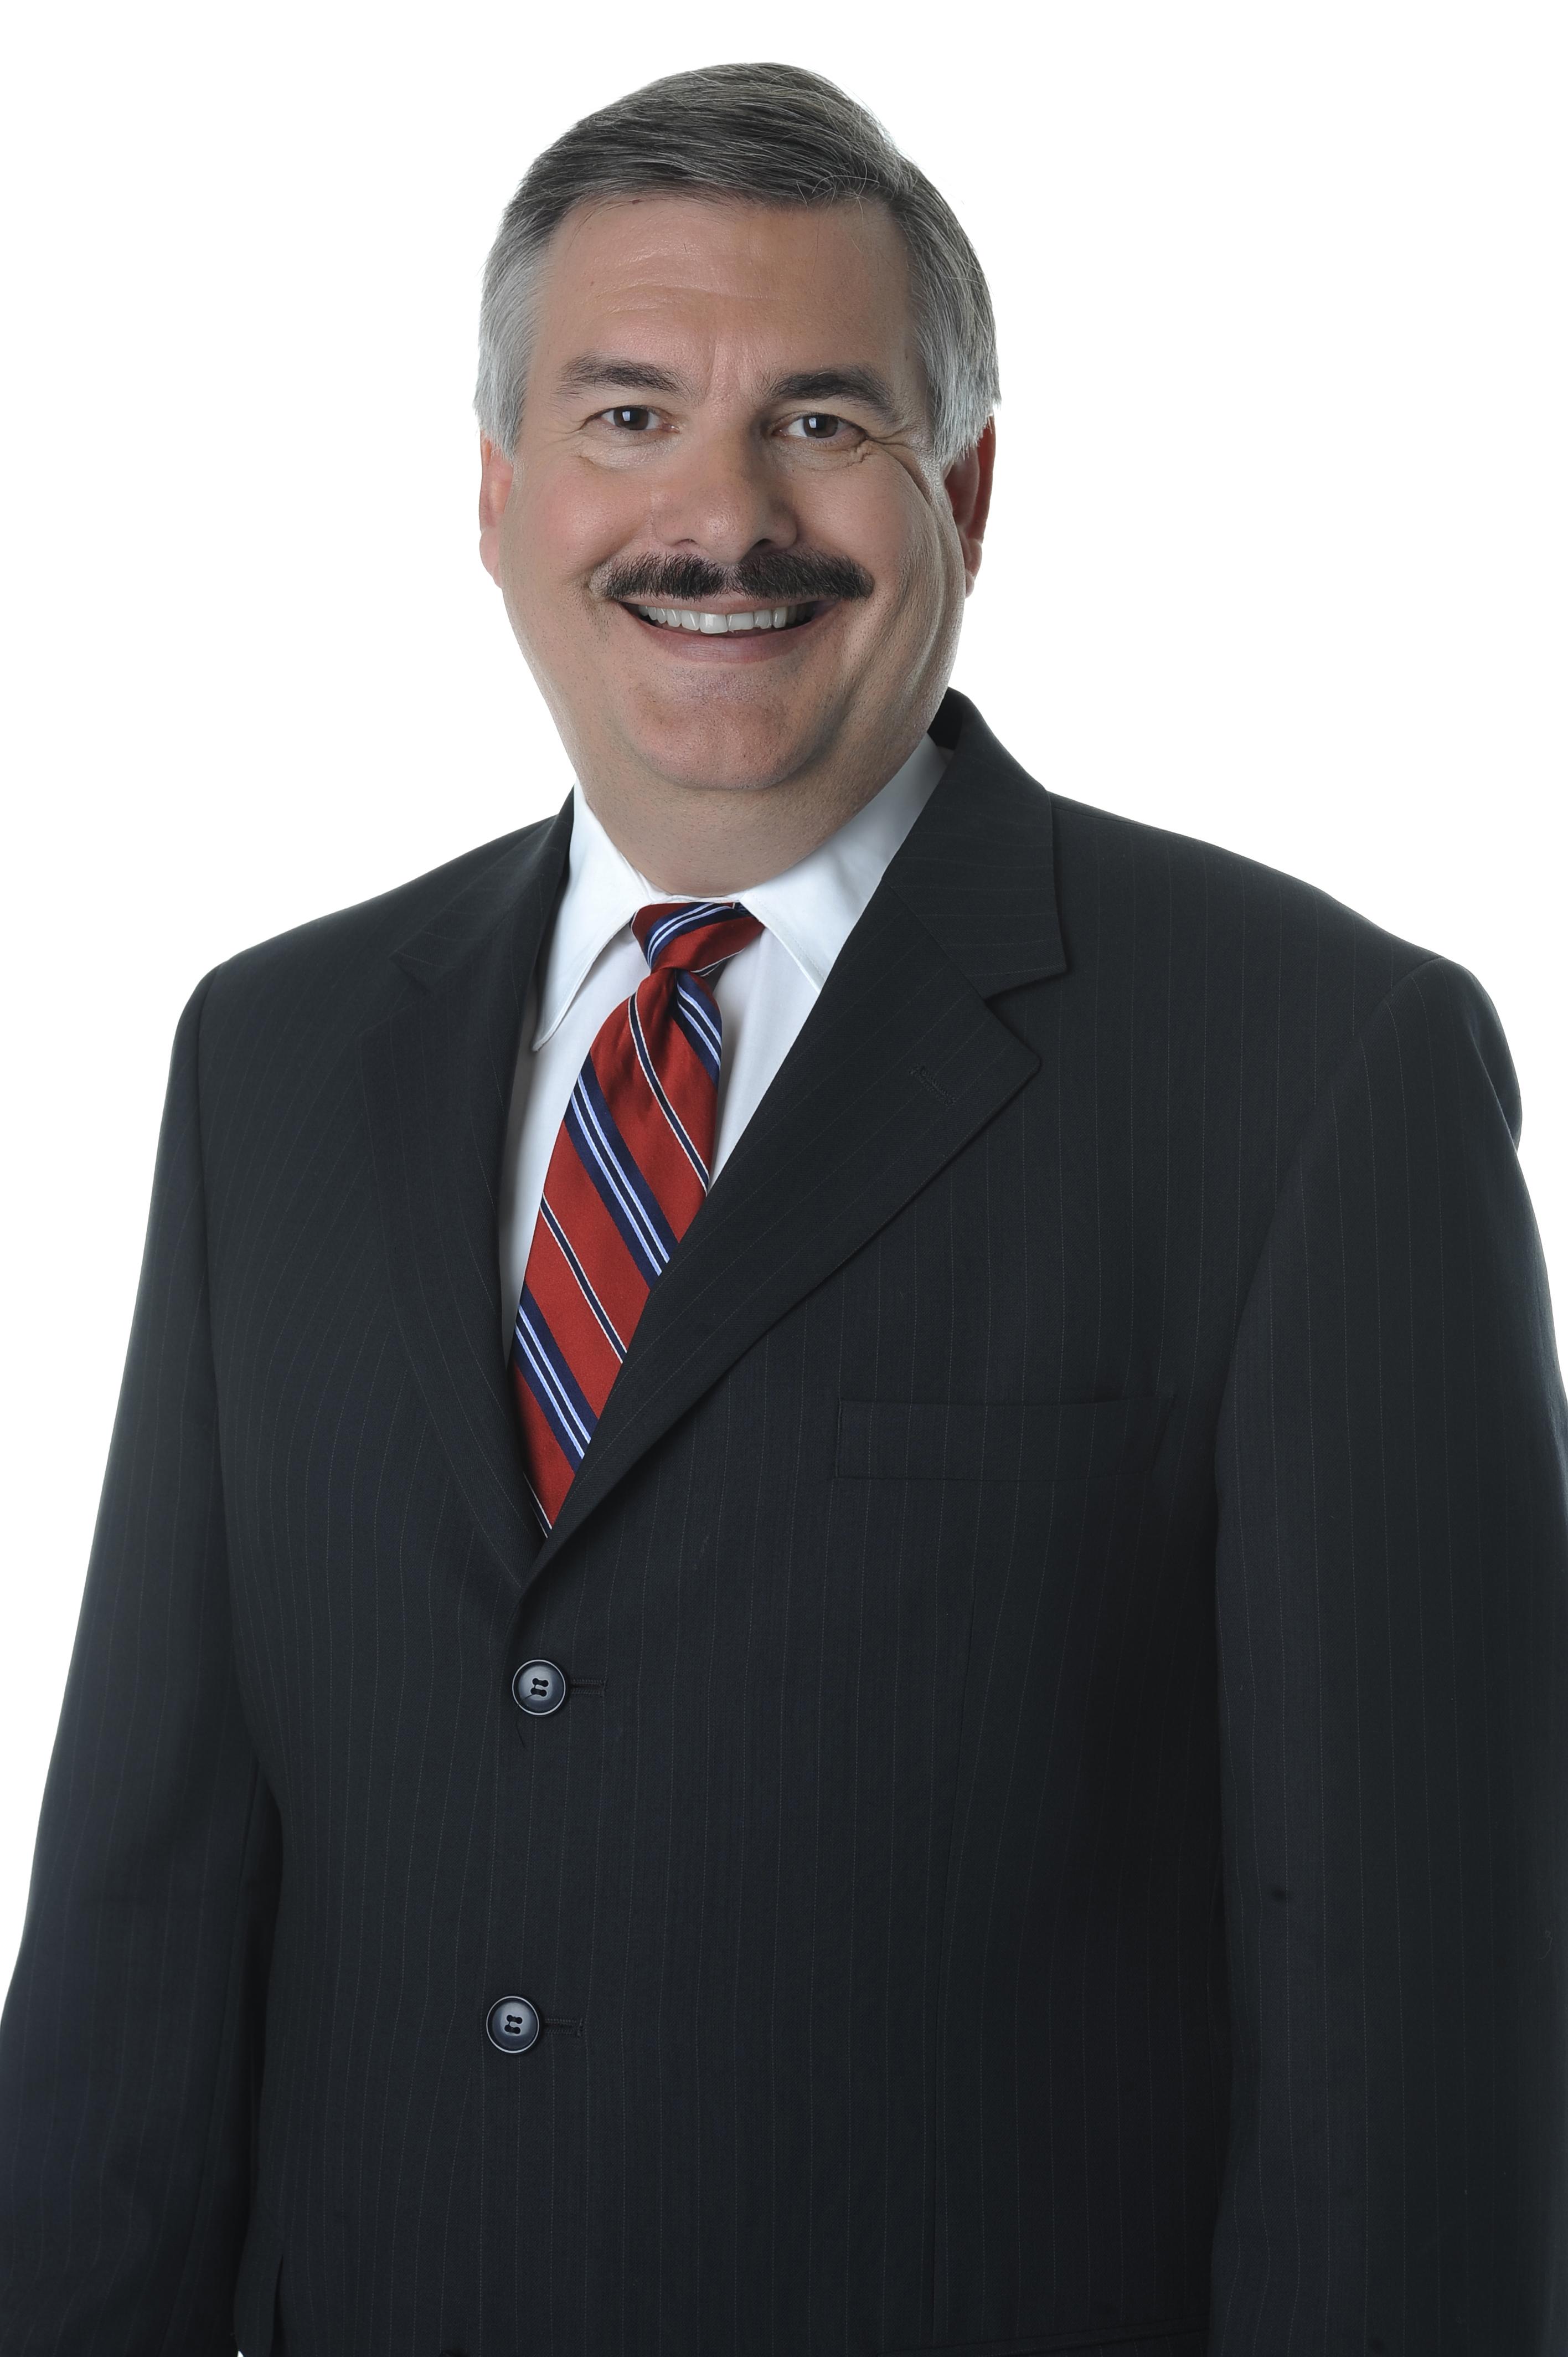 Jeffrey Shoskin